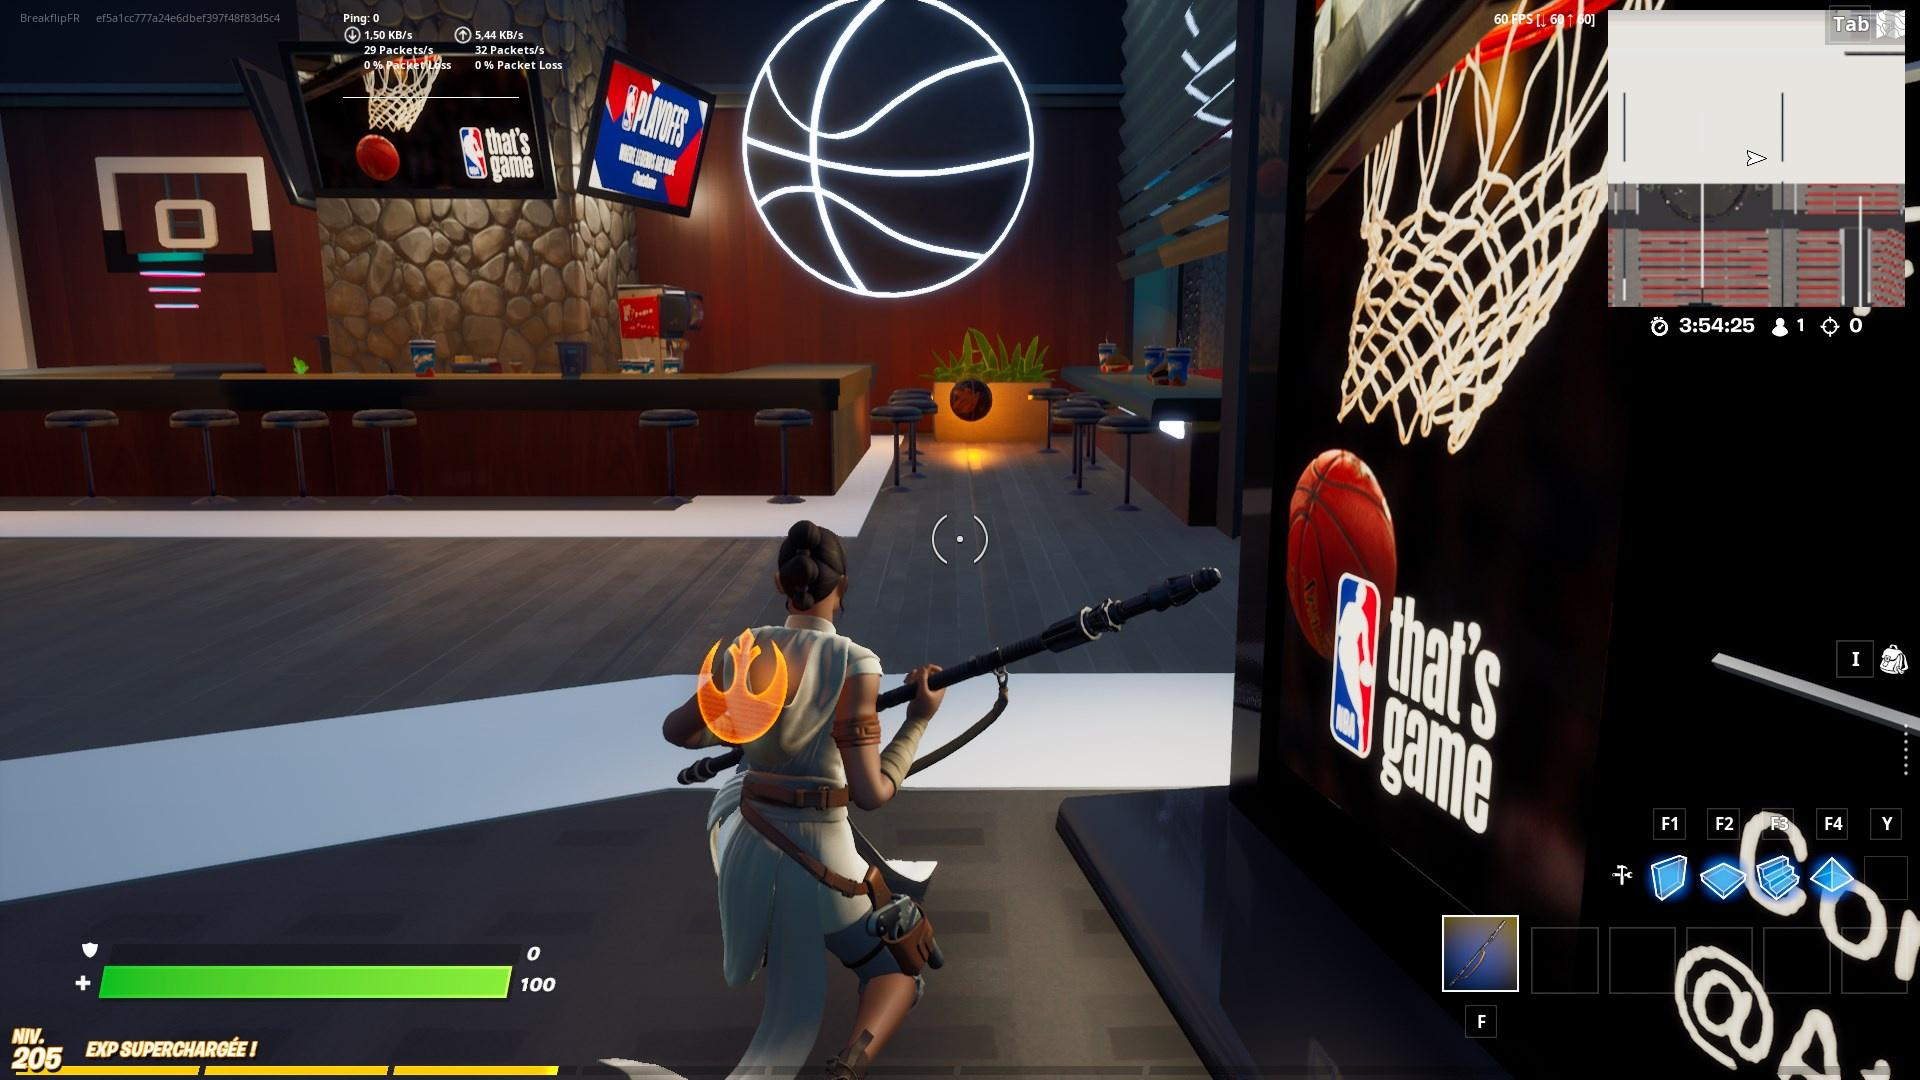 Challenge-fortnite-league-national-five-hidden-balls-balloon-basket-5